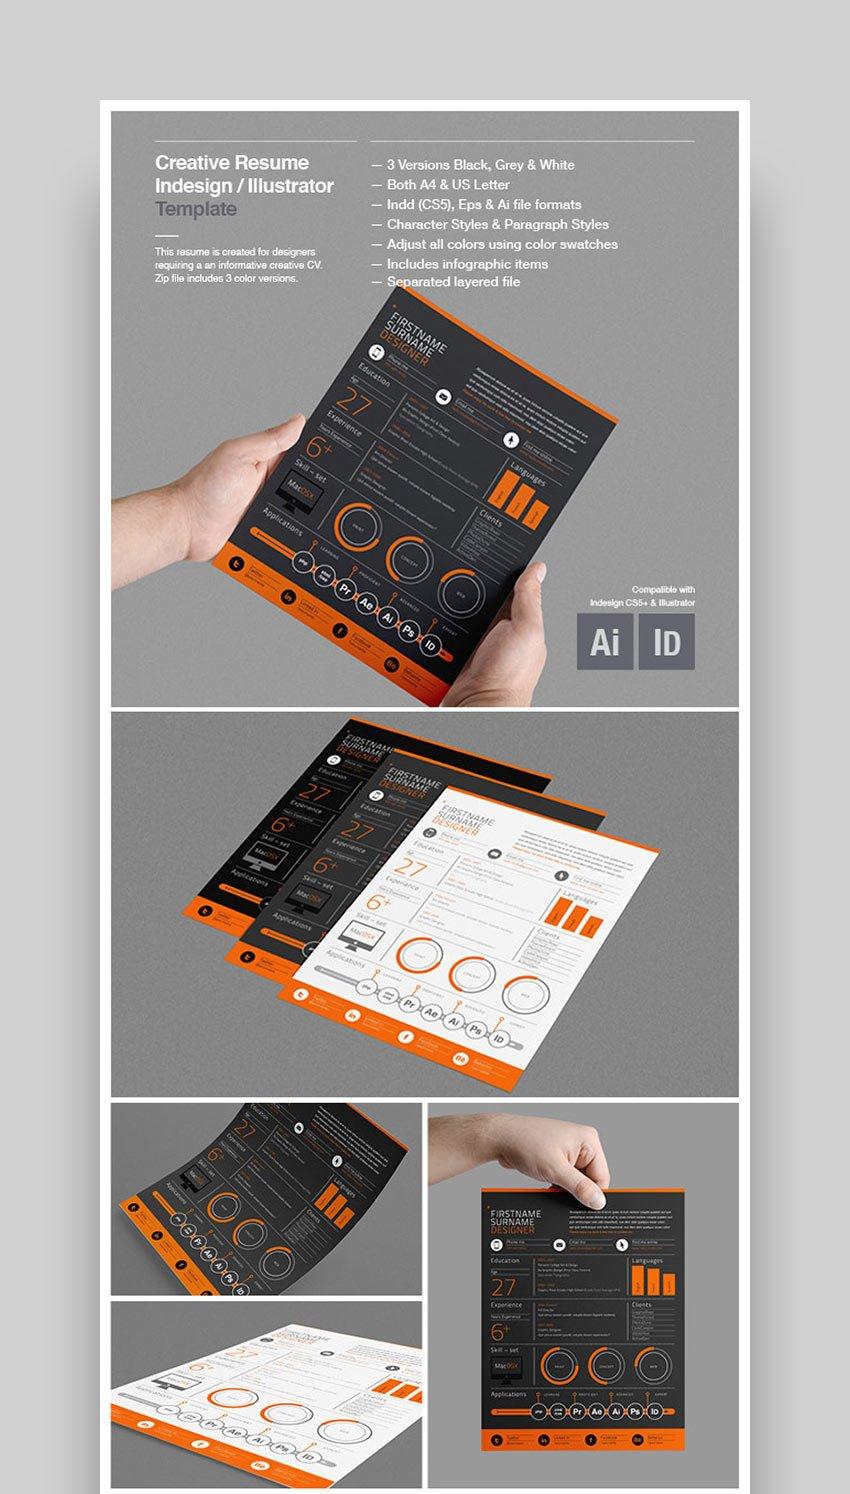 Creative Resume Template Design